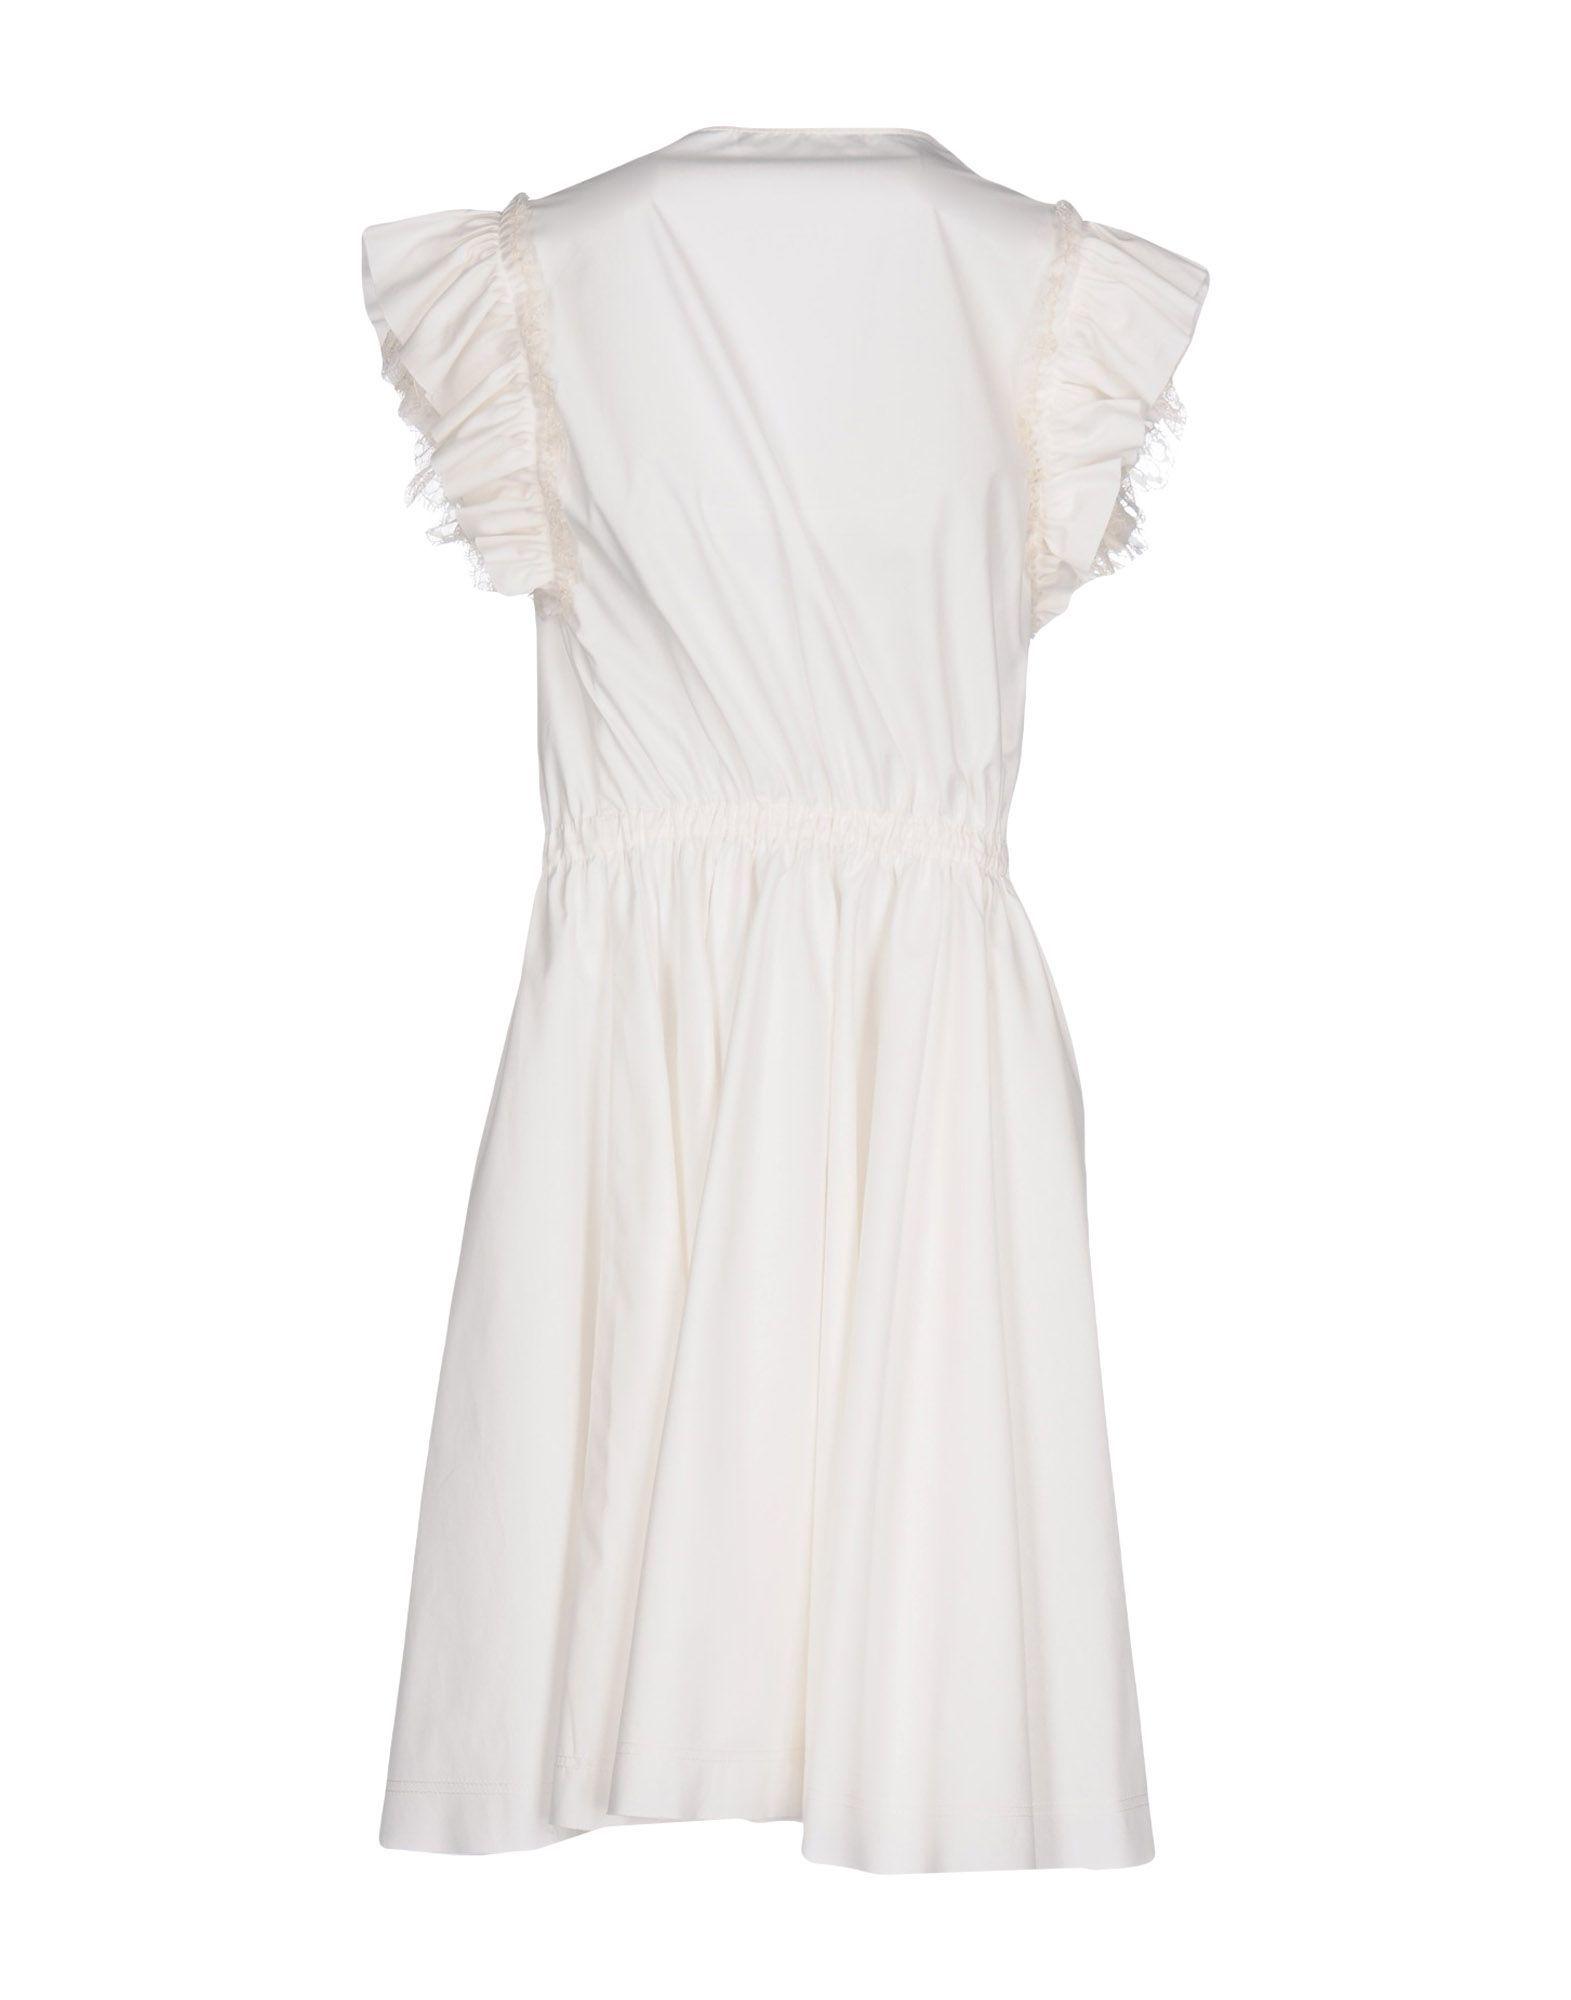 Philosophy Di Lorenzo Serafini White Cotton Short Dress